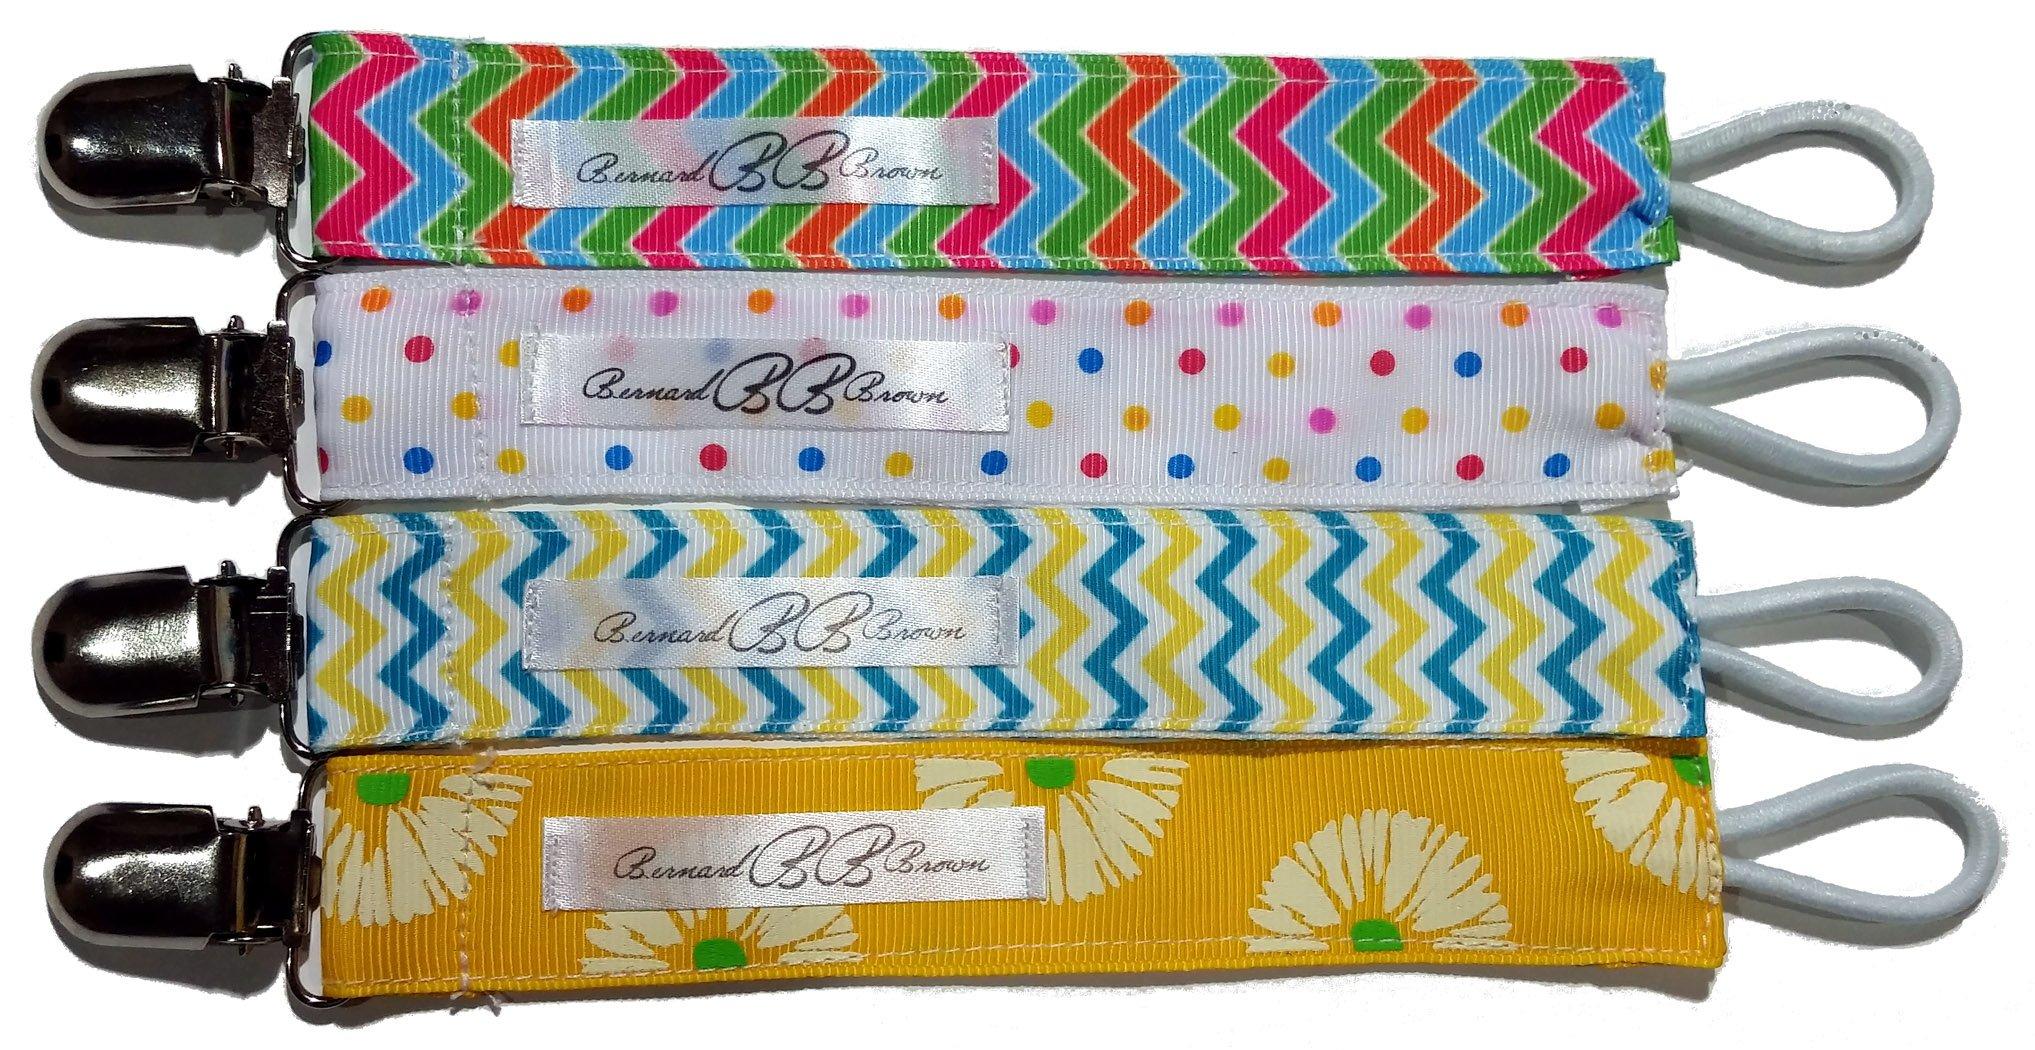 4 Pack Pacifier Clip Leash Teething Ring Holder By Bernard Brown Great Baby Shower Gift - Unisex Colors by Bernard Brown